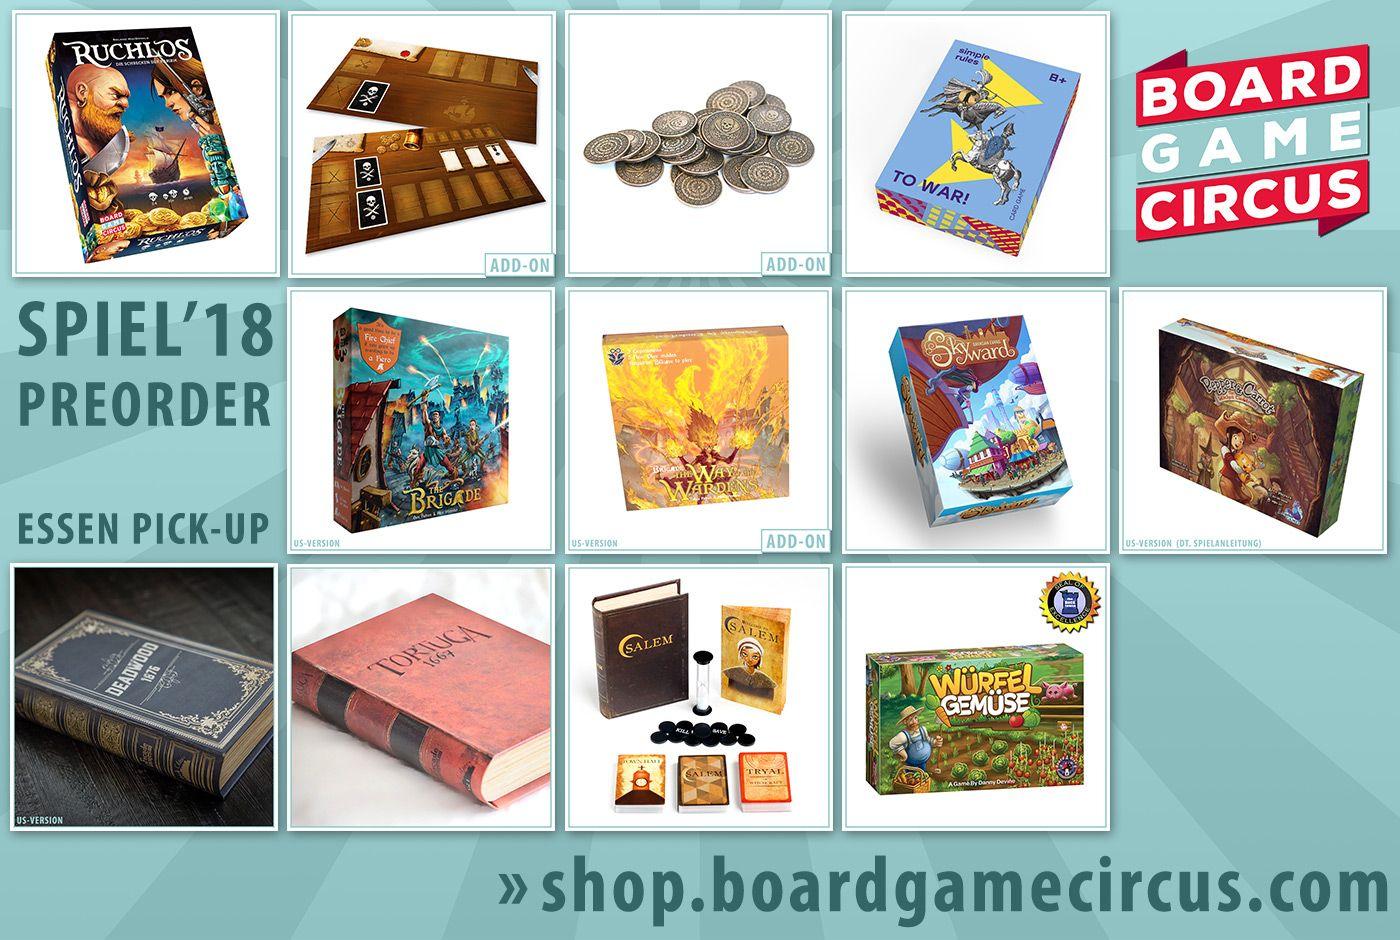 Board Game Circus SPIEL'18 (Essen) Preorder | BoardGameGeek